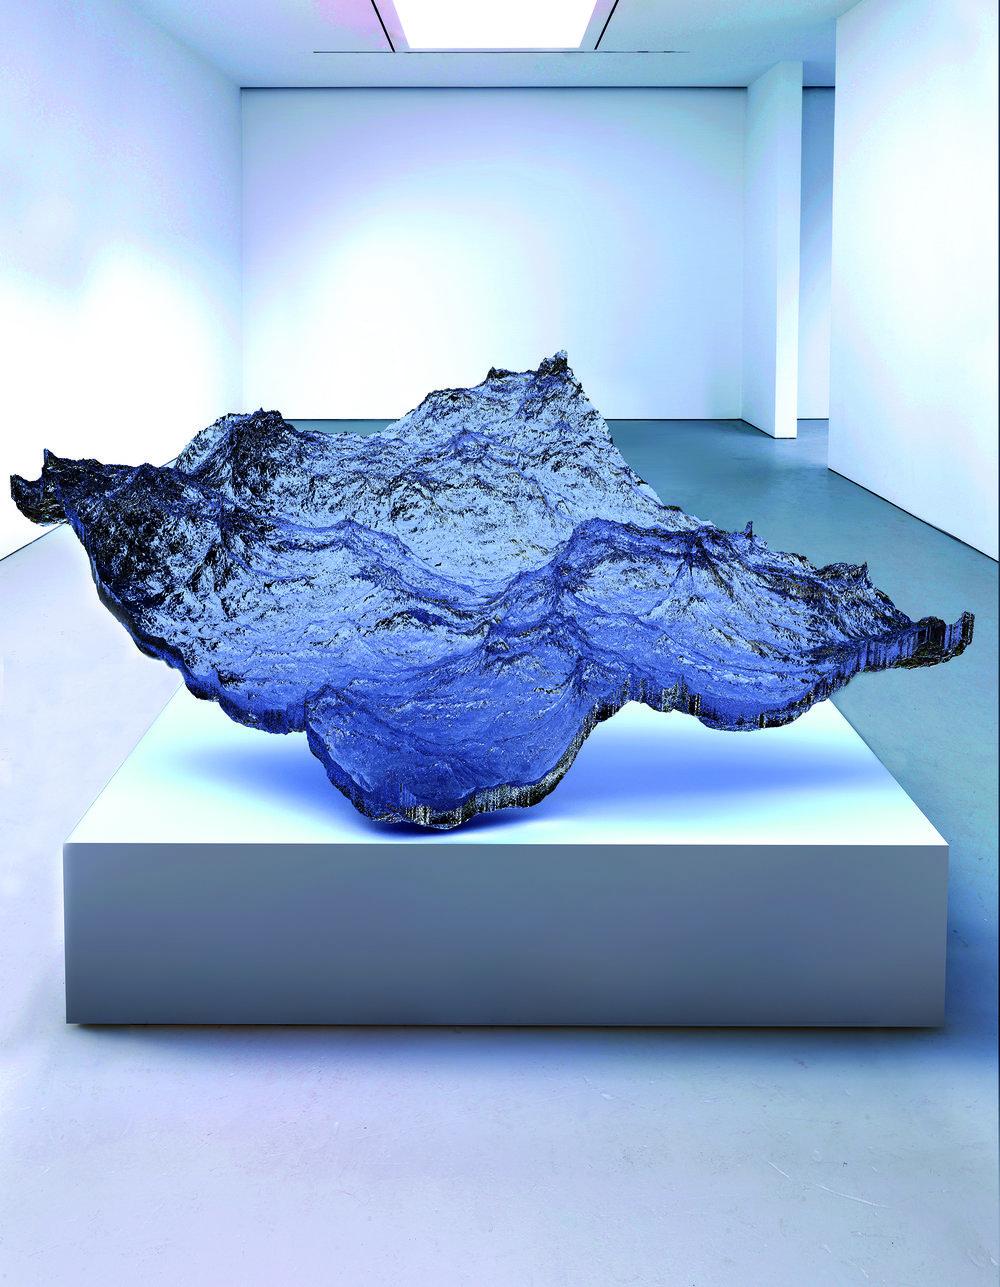 Piece of Ocean - Stratasys Objet1000